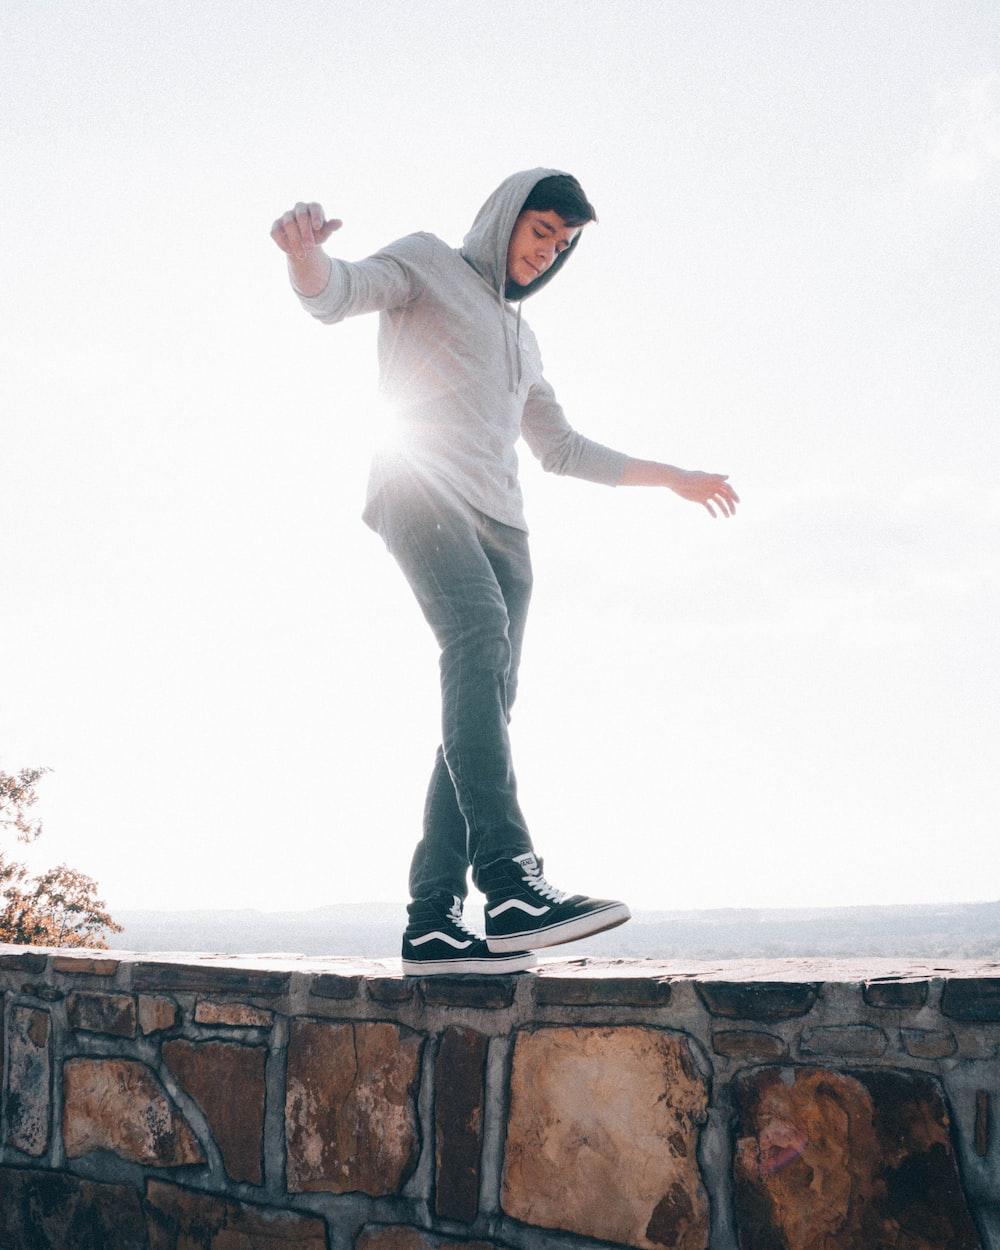 man wearing pullover walking on concrete wall